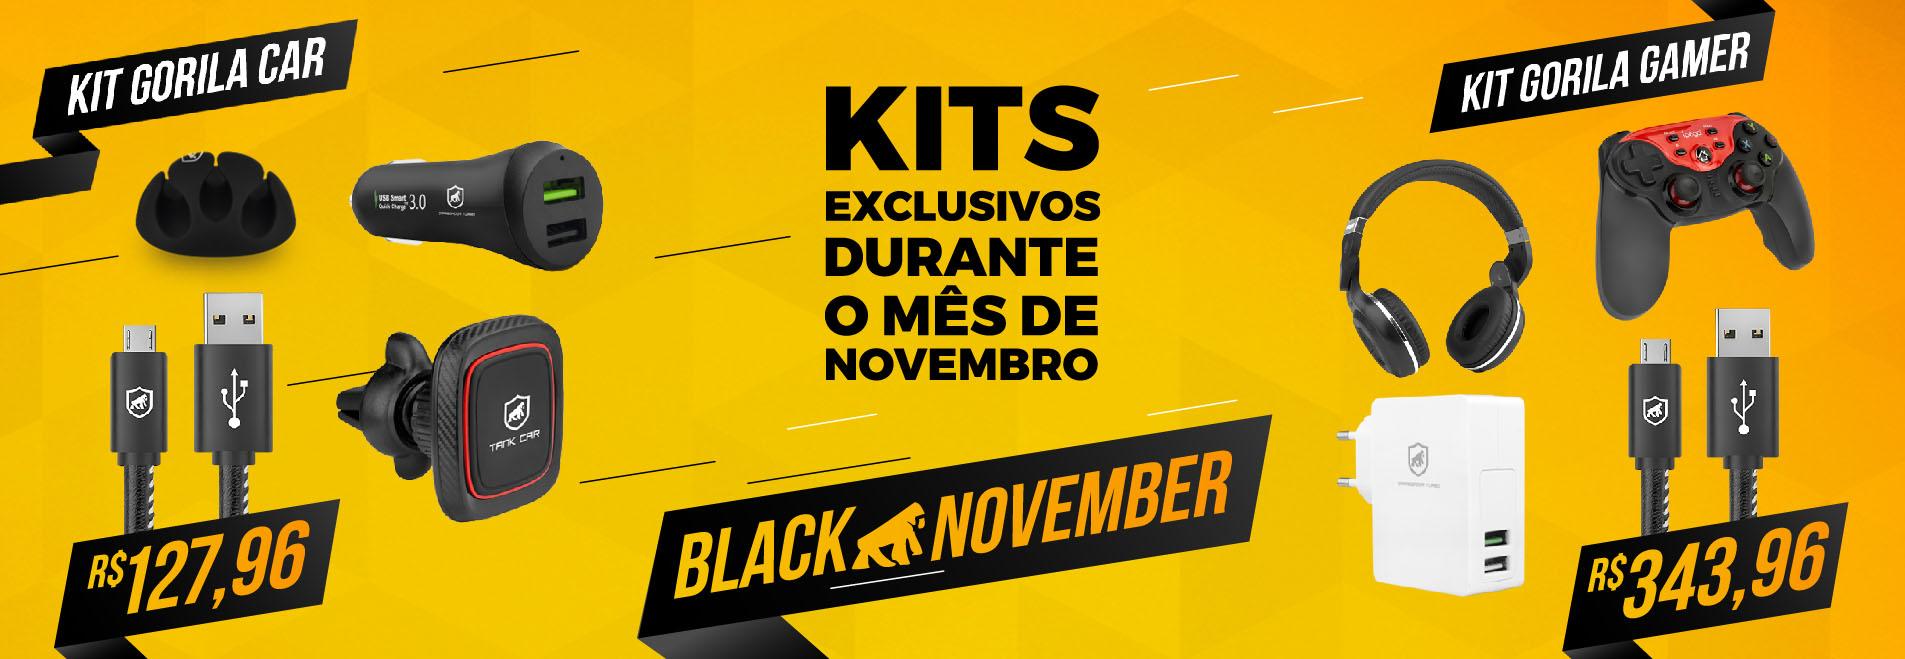 Banner Kits - Black November